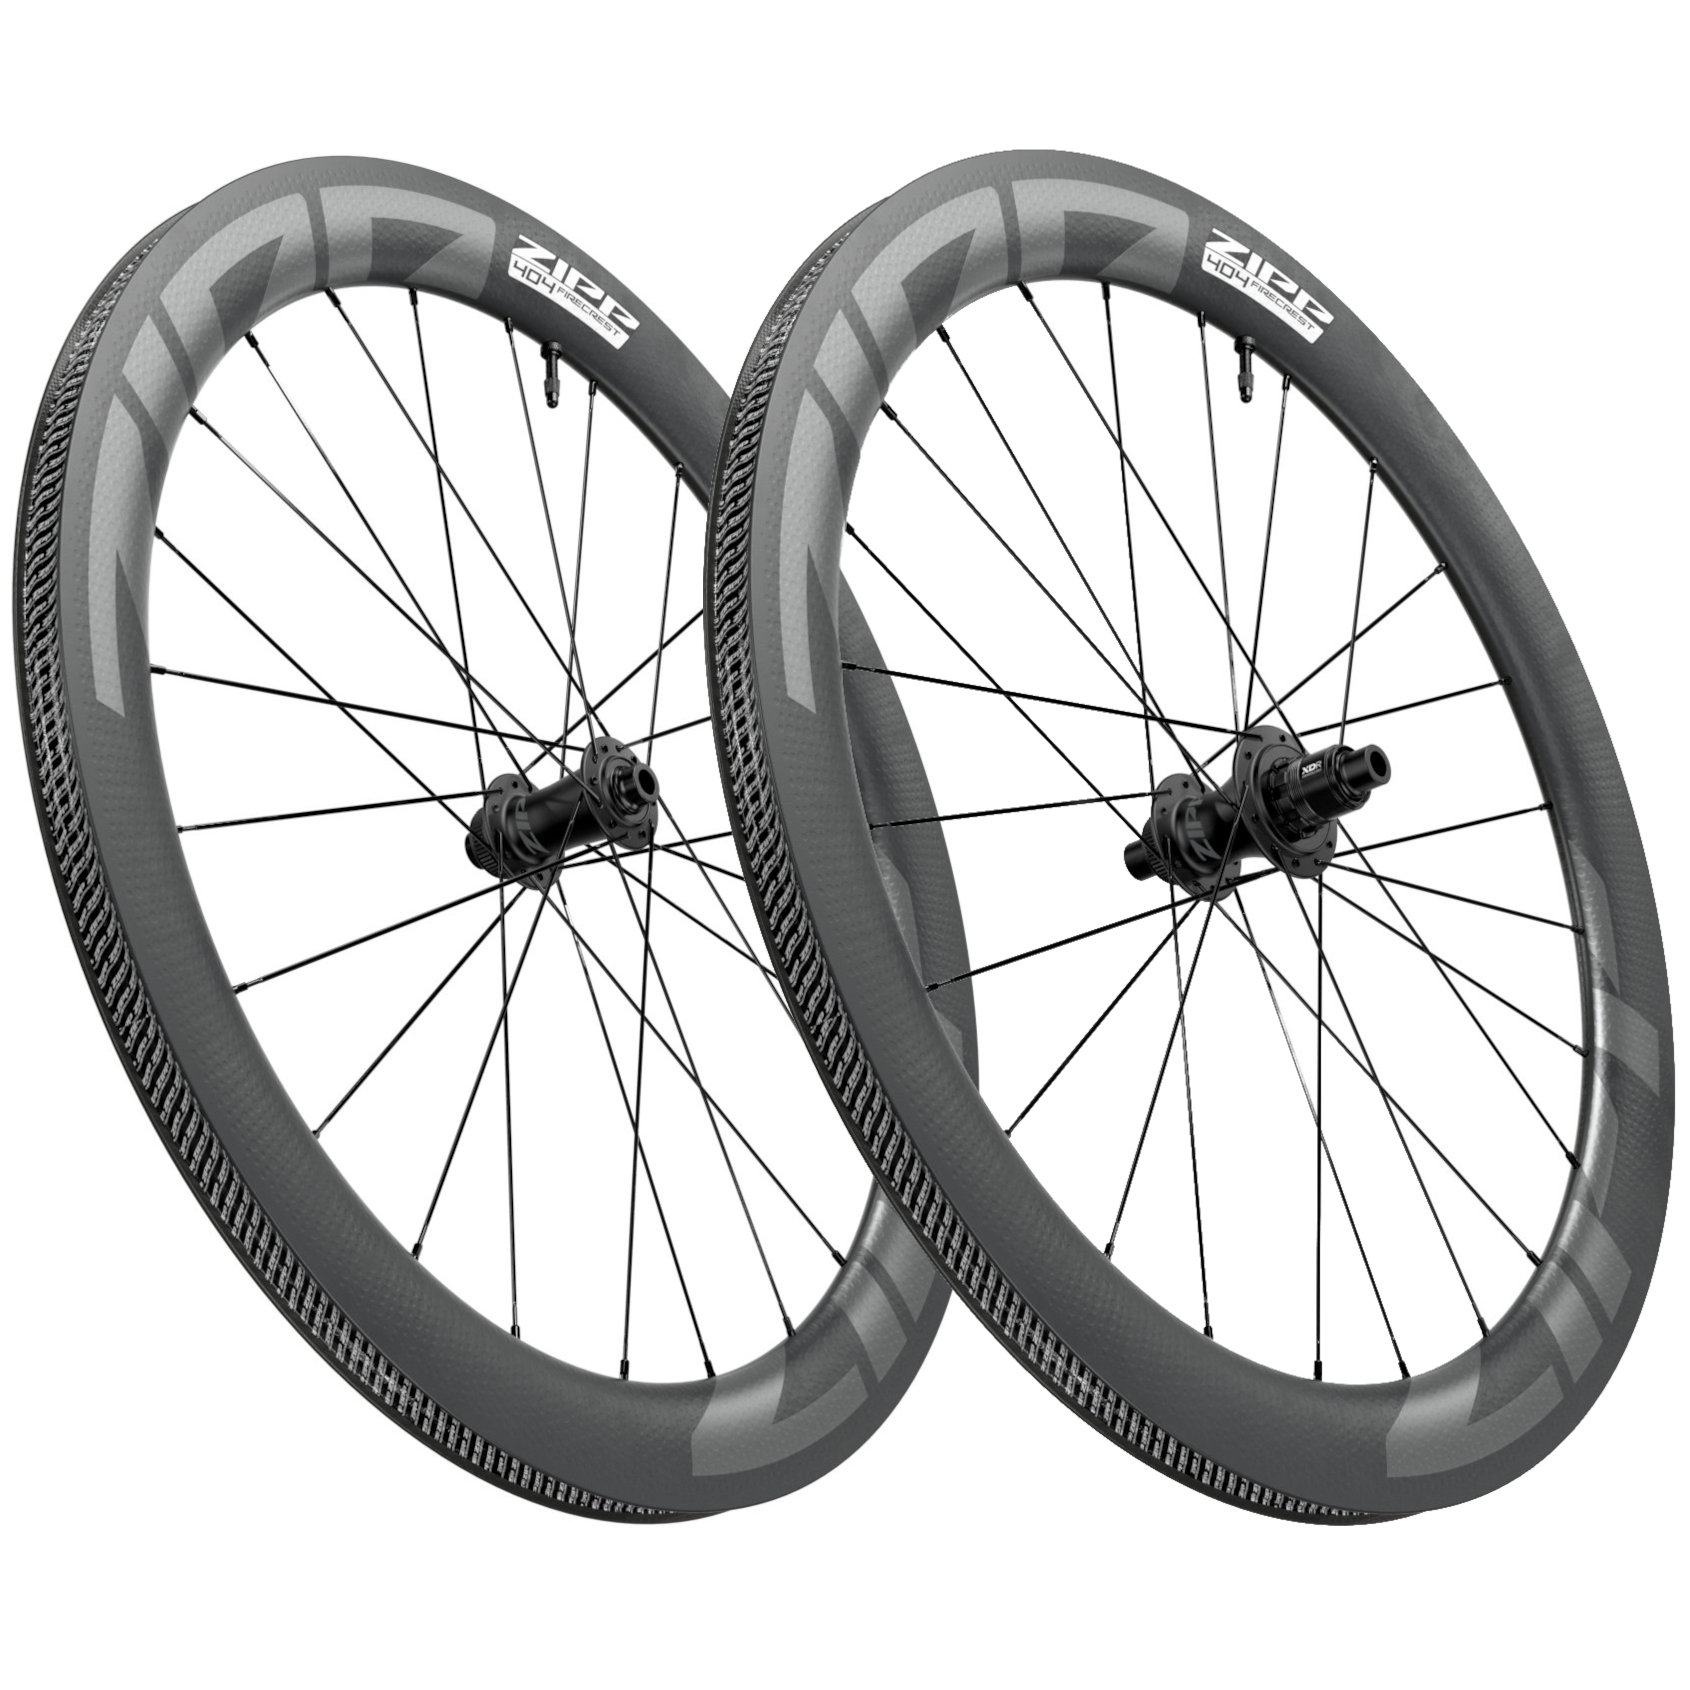 ZIPP 404 Firecrest Carbon Laufradsatz - Tubeless - Centerlock - VR: 12x100mm   HR: 12x142mm - schwarz